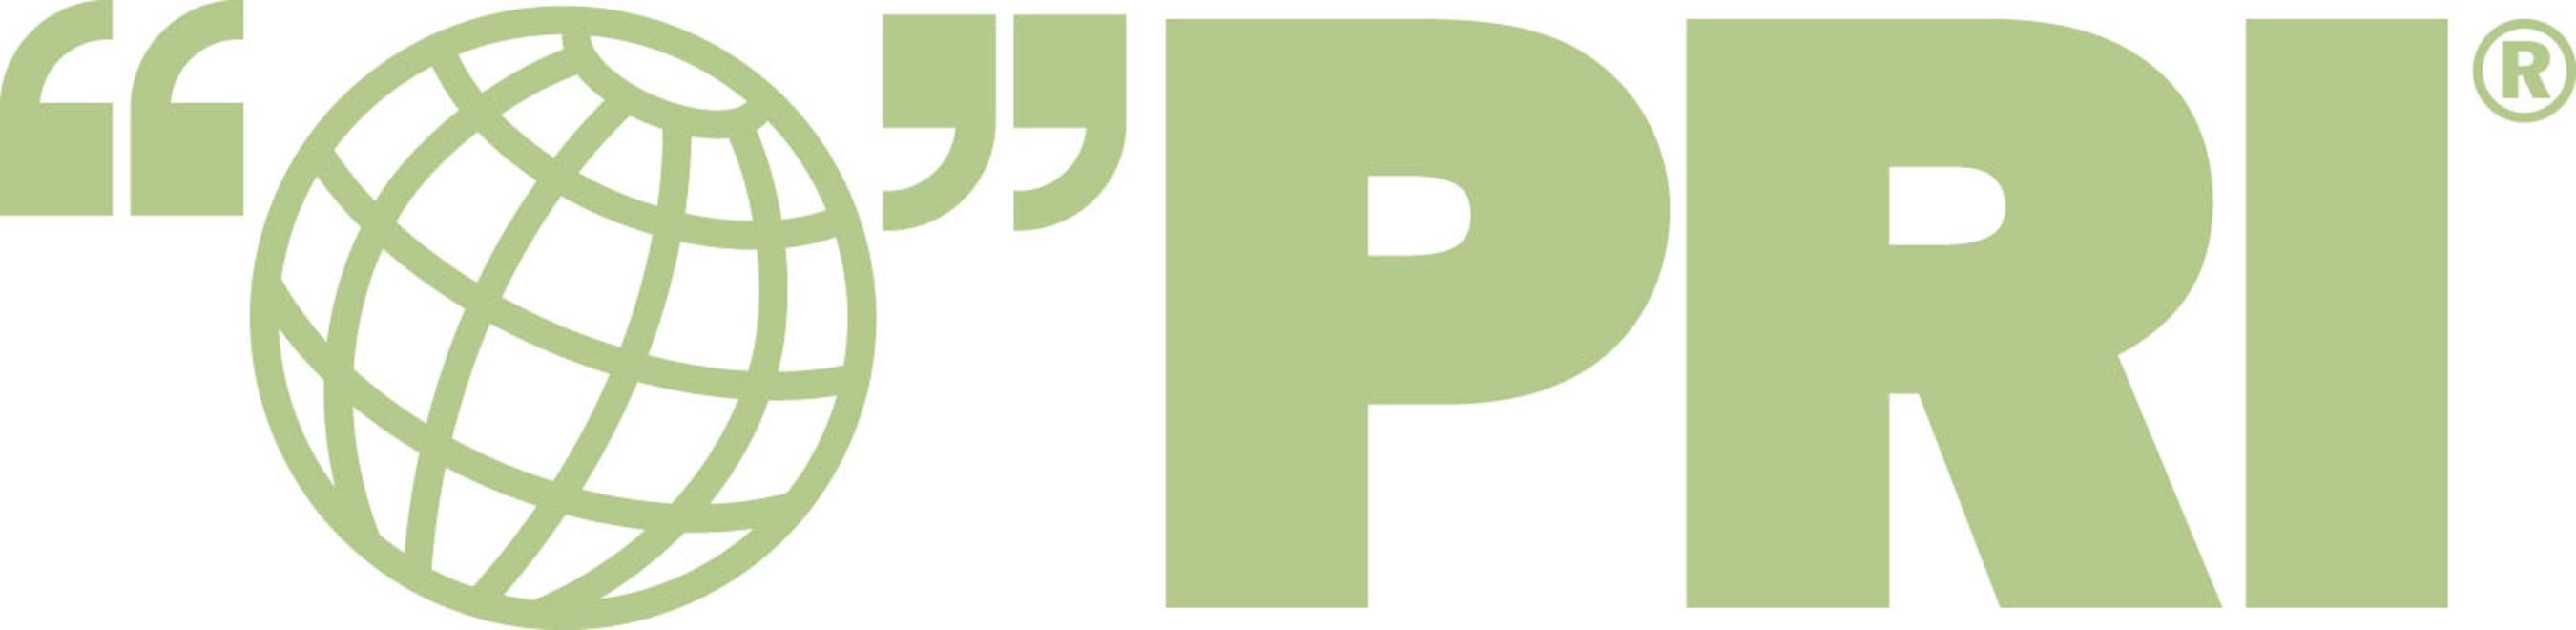 Public Radio International logo.